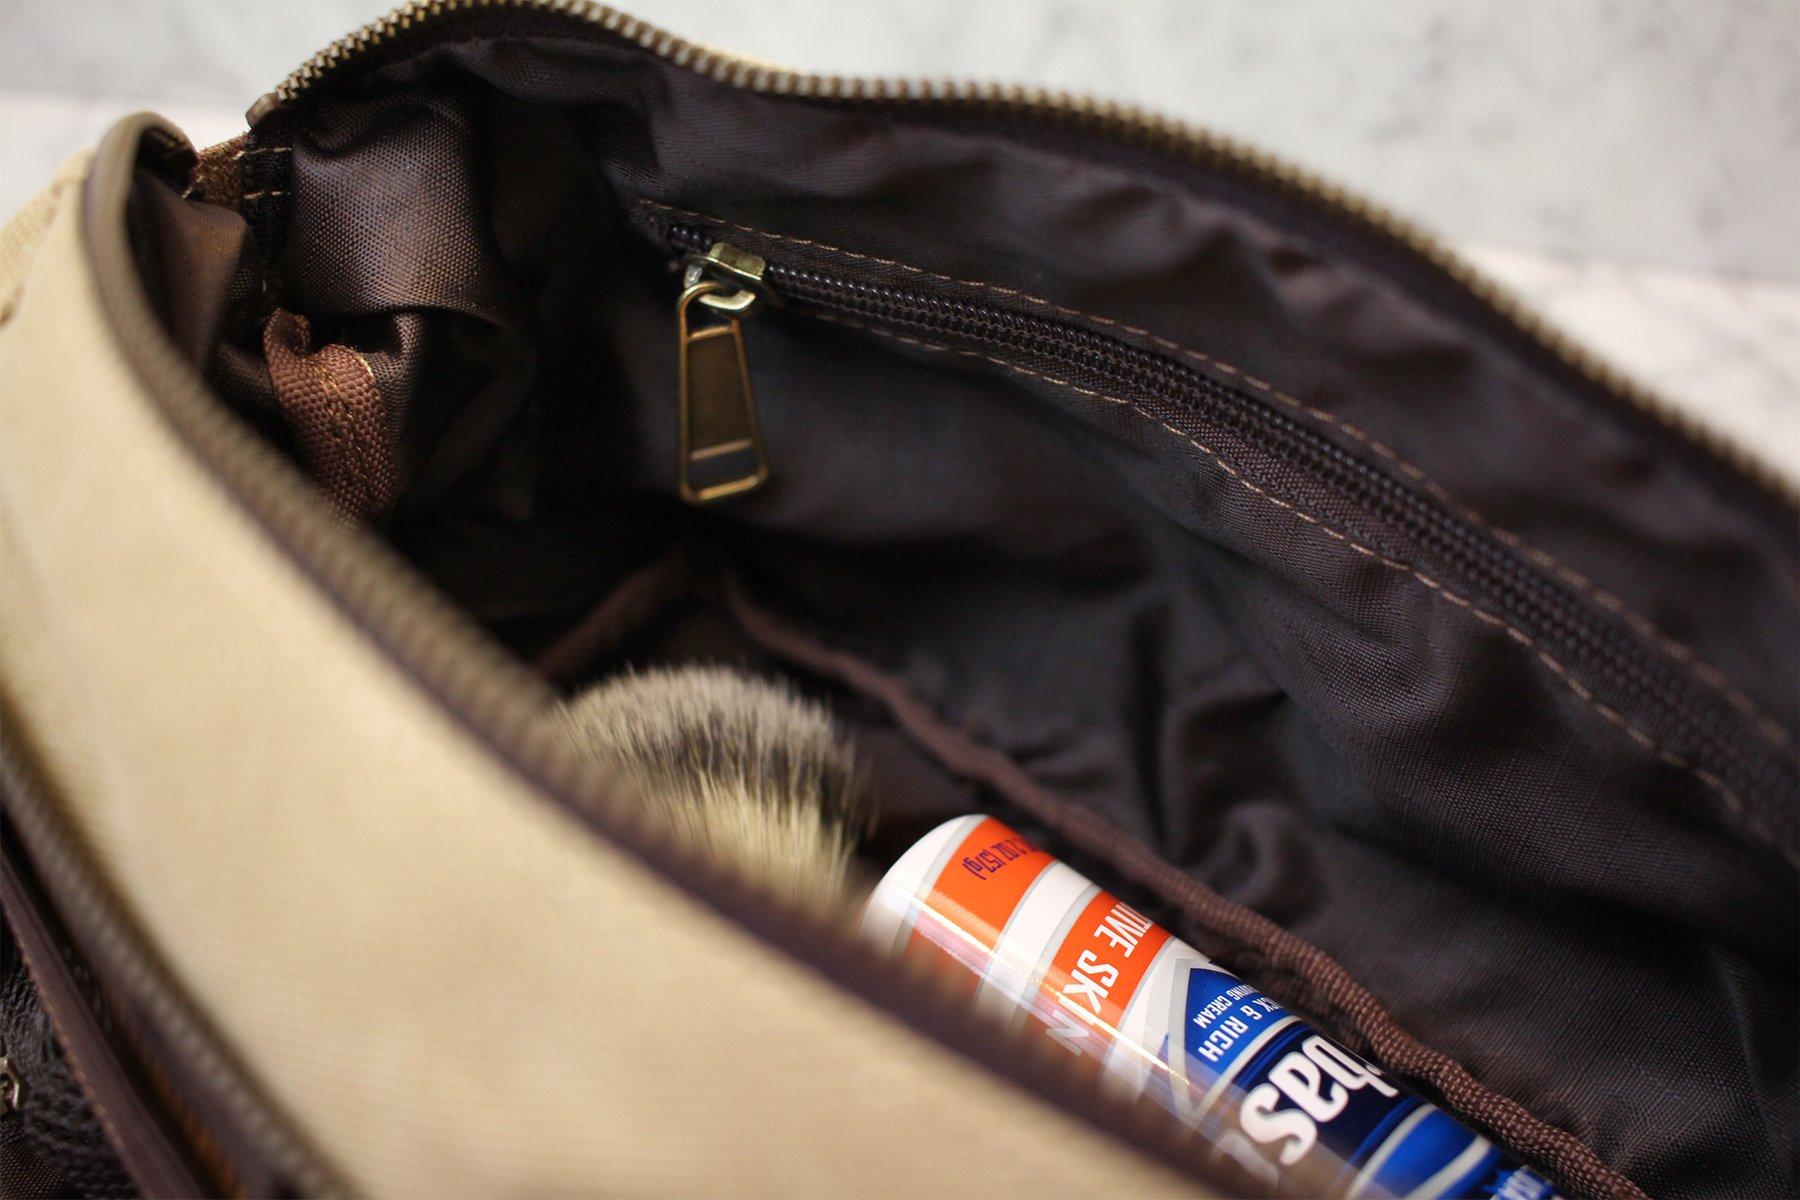 DOPP Kit Mens Toiletry Travel Bag YKK Zipper Canvas Leather (Medium, Khaki  - 3 days shipping). Size  7.3 x 6 x 4.7 inches. 463fde9ae5